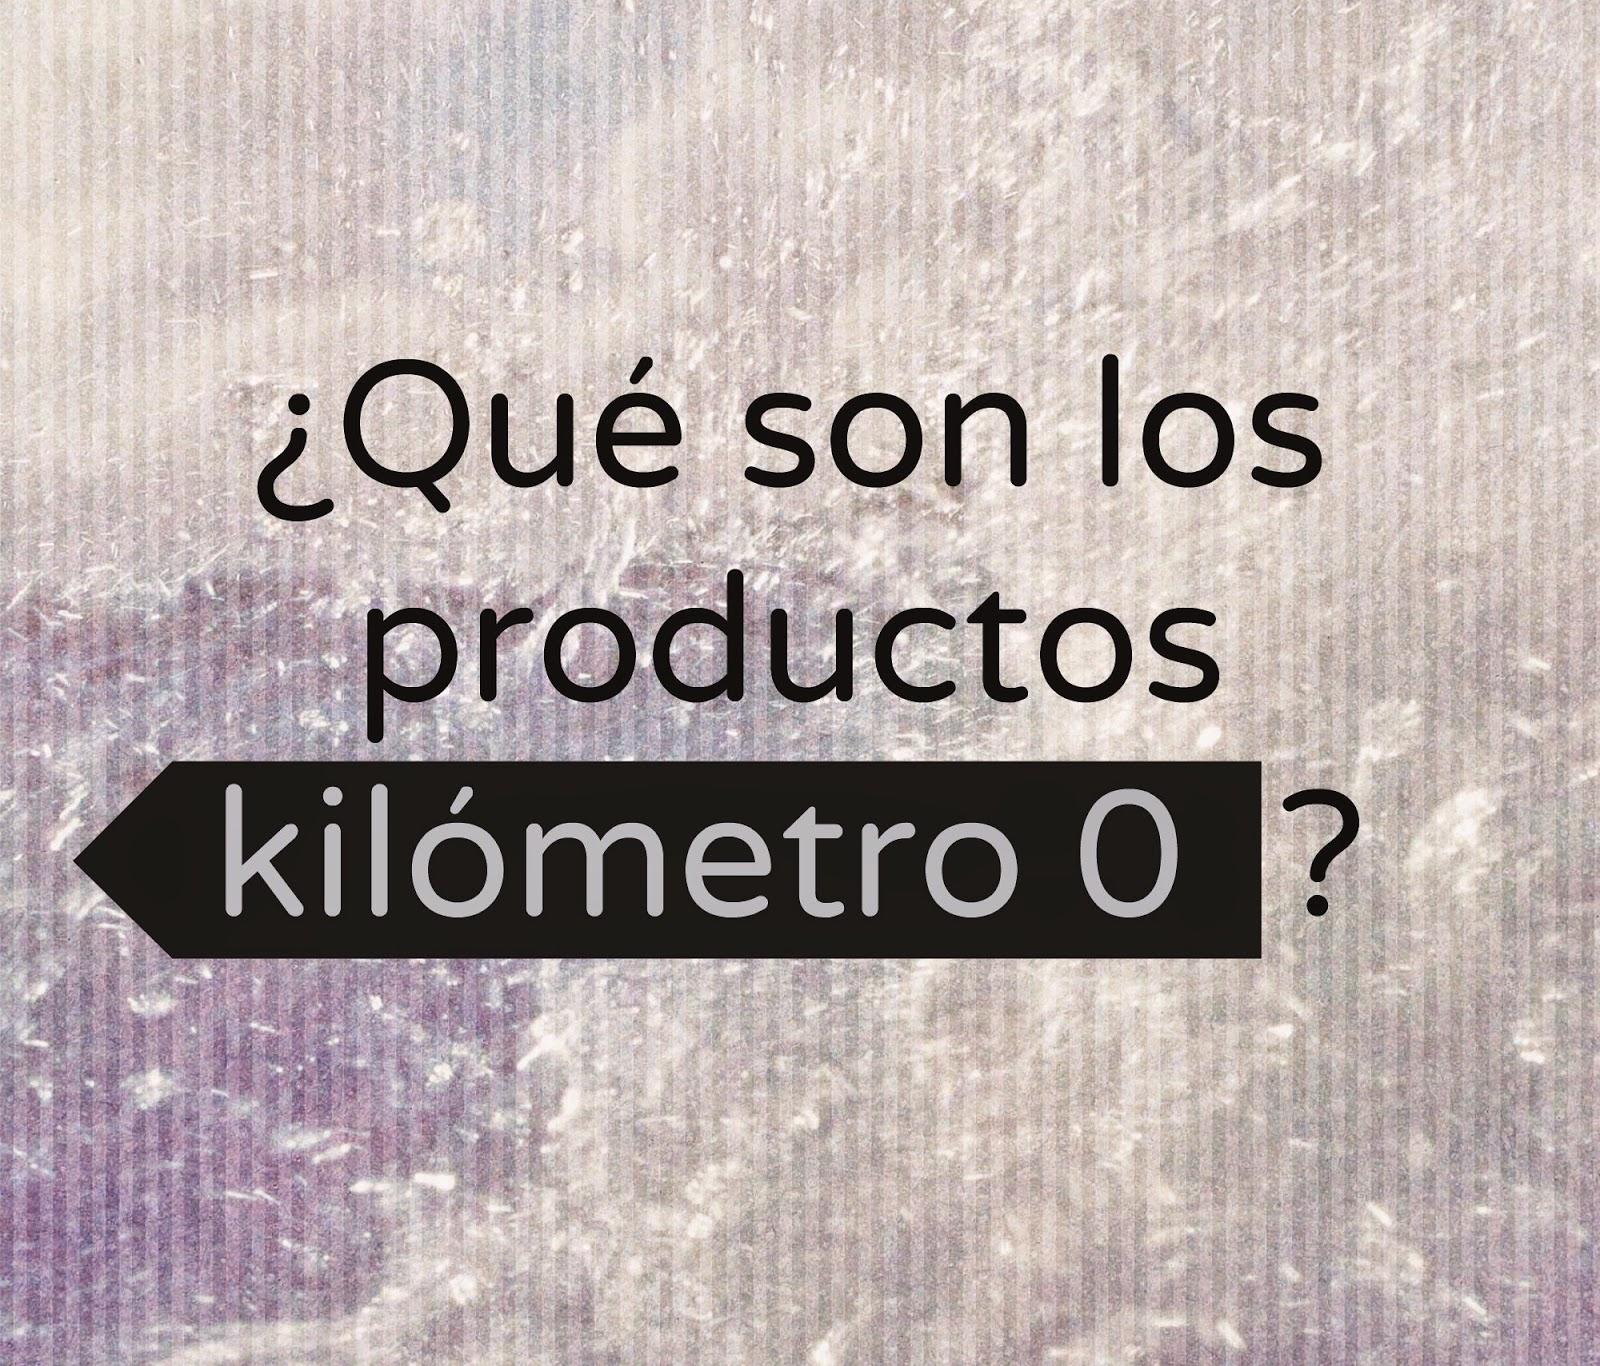 productos kilometro 0